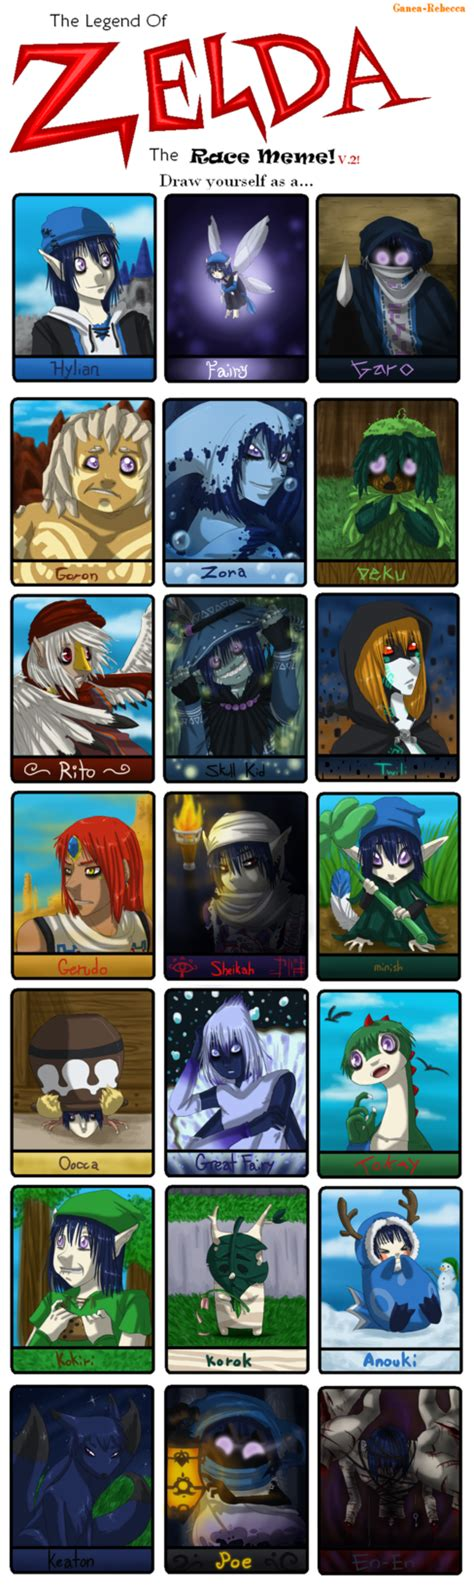 Zelda Memes - zelda race meme by tehartmonkey on deviantart